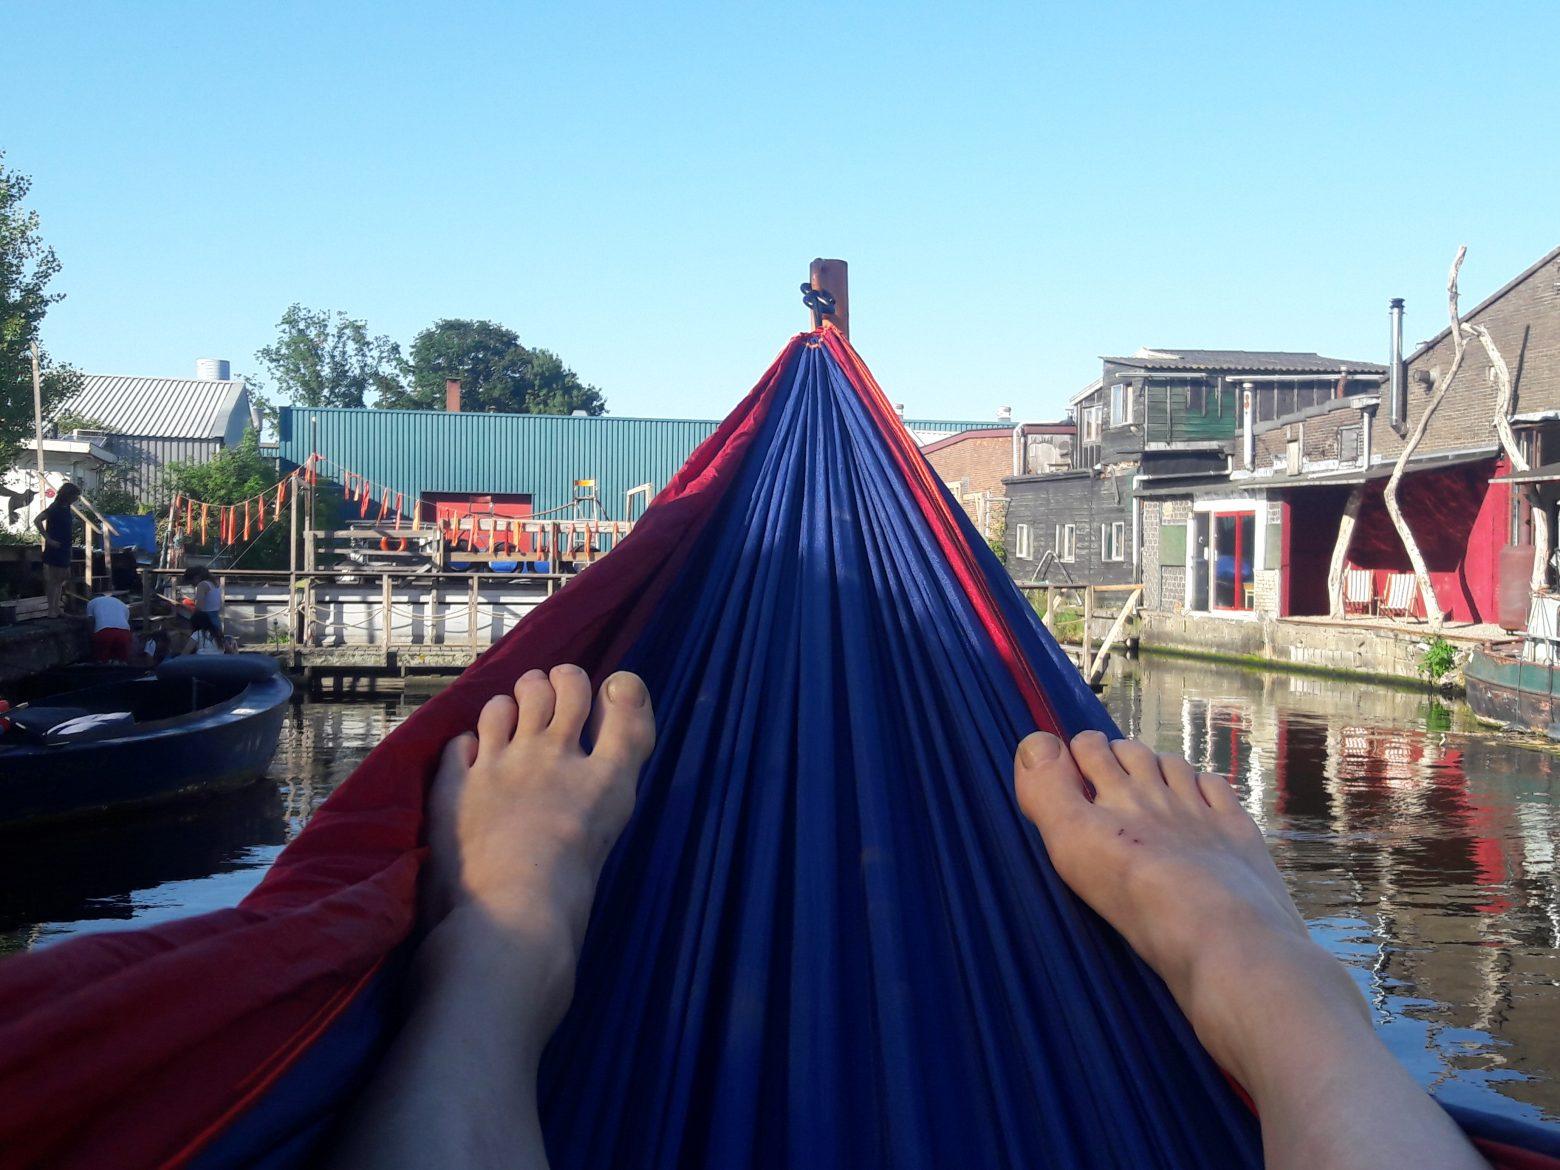 My OneFit Week – Monday, Aerial Restorative Yoga at Rasalila